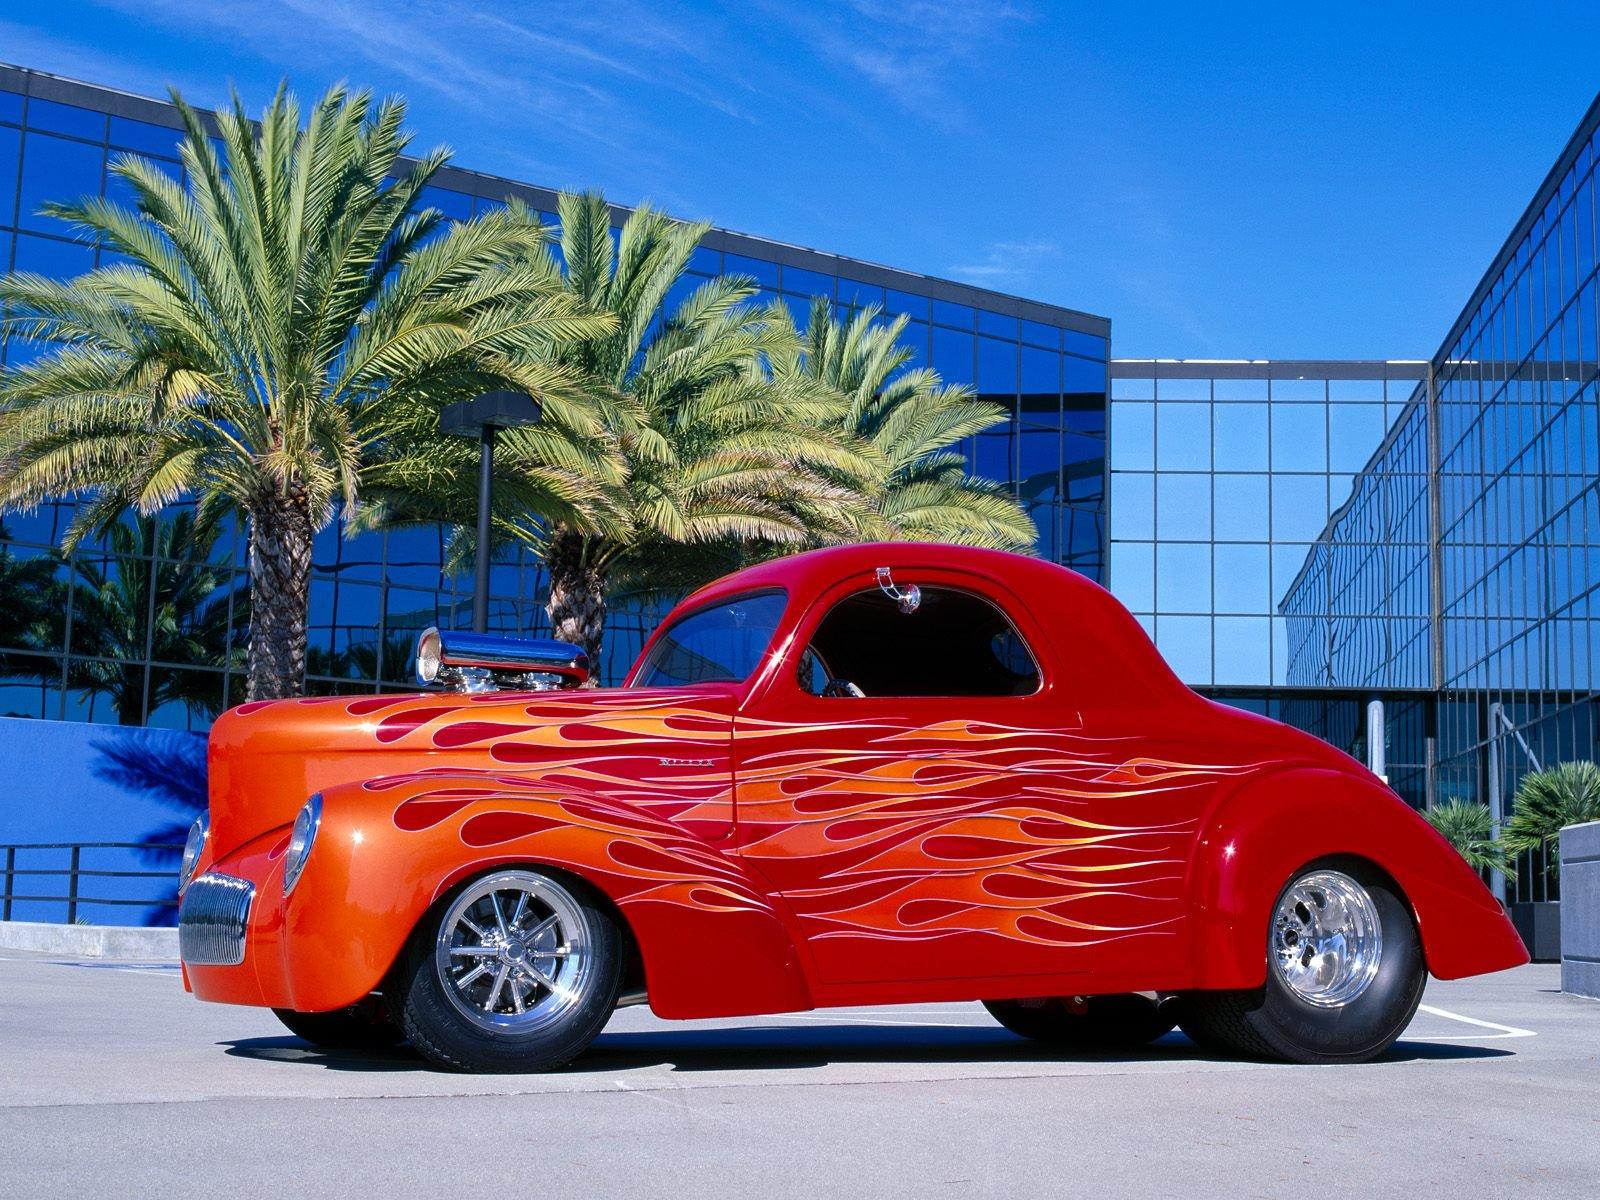 http://1.bp.blogspot.com/_Eq0z9sFgDsQ/TCzCJ__LIUI/AAAAAAAAAOU/2PIM9aPAxo4/s1600/fondos-pantalla-coches-tuning-1600.jpg